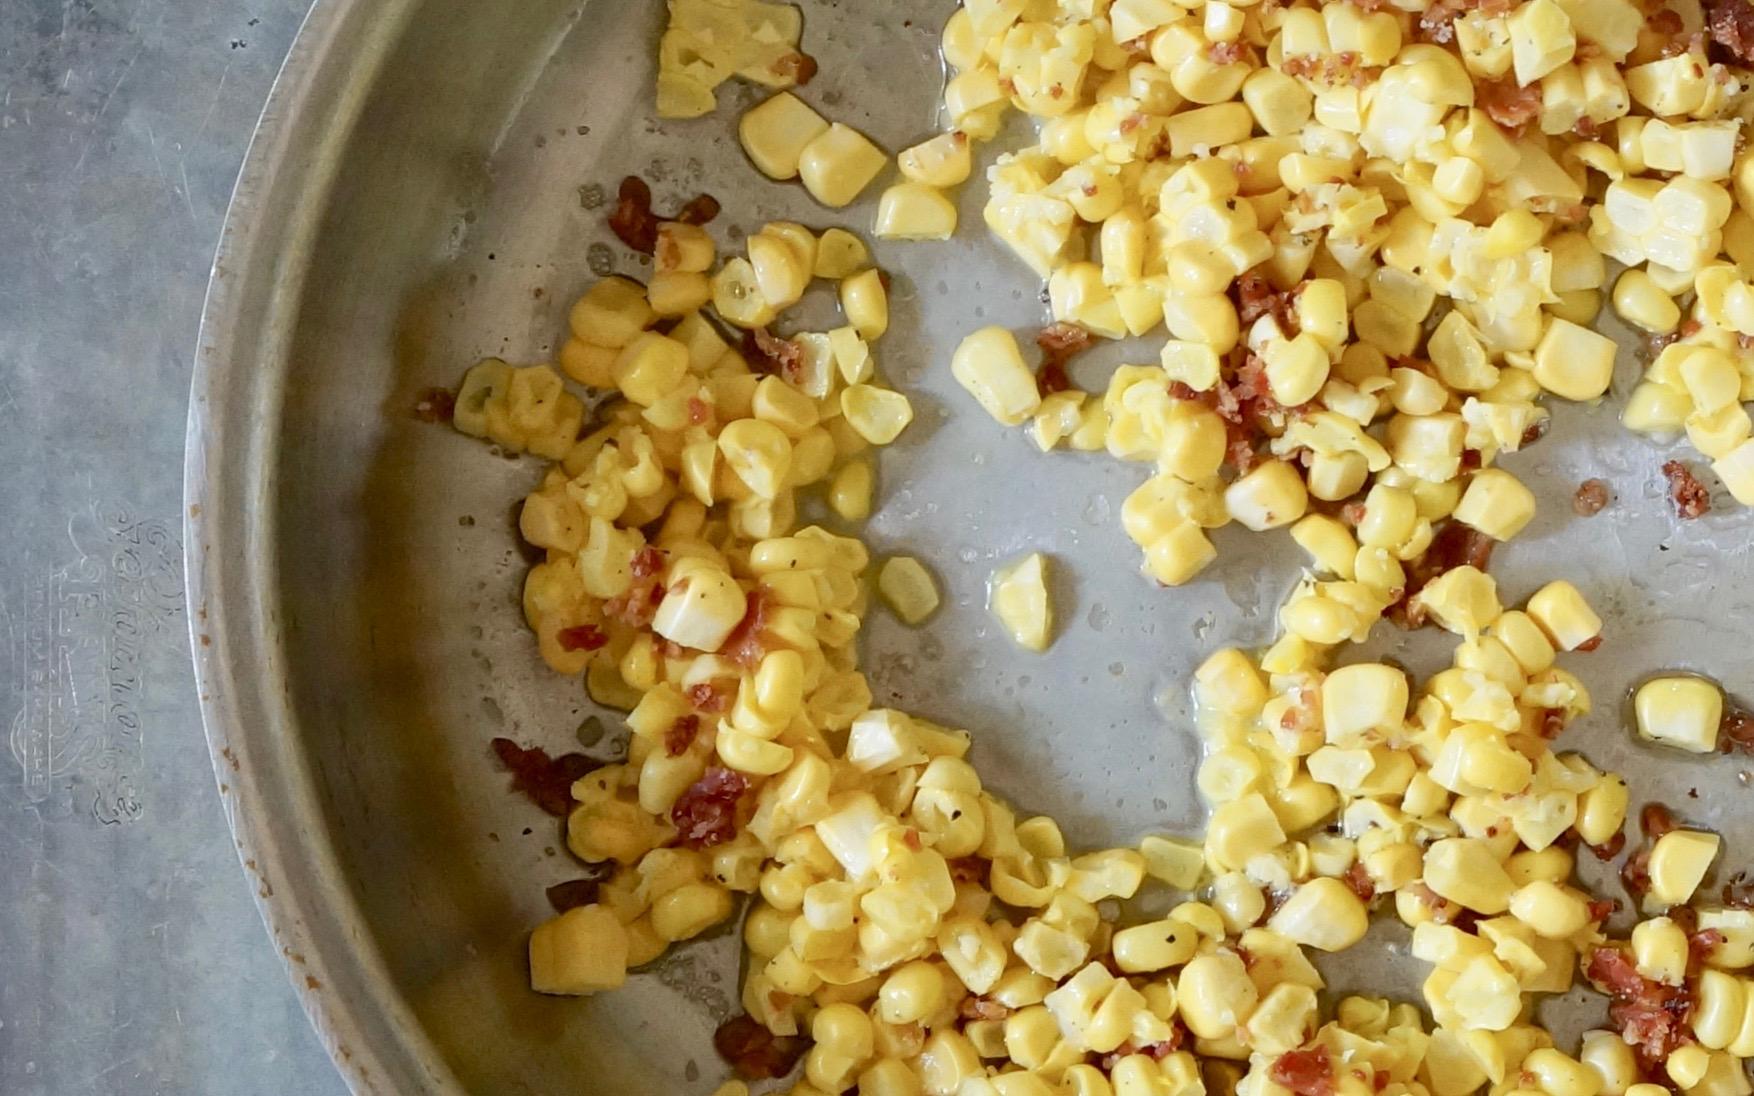 Fried-Corn-With-Bacon-Rebecca-Gordon-Editor-In-CHief-Buttermilk-Lipstick-Culinary-Entertaining-Techniques-Southern-Hostess-RebeccaGordon-Pastry-Chef-Birmingham-Alabama